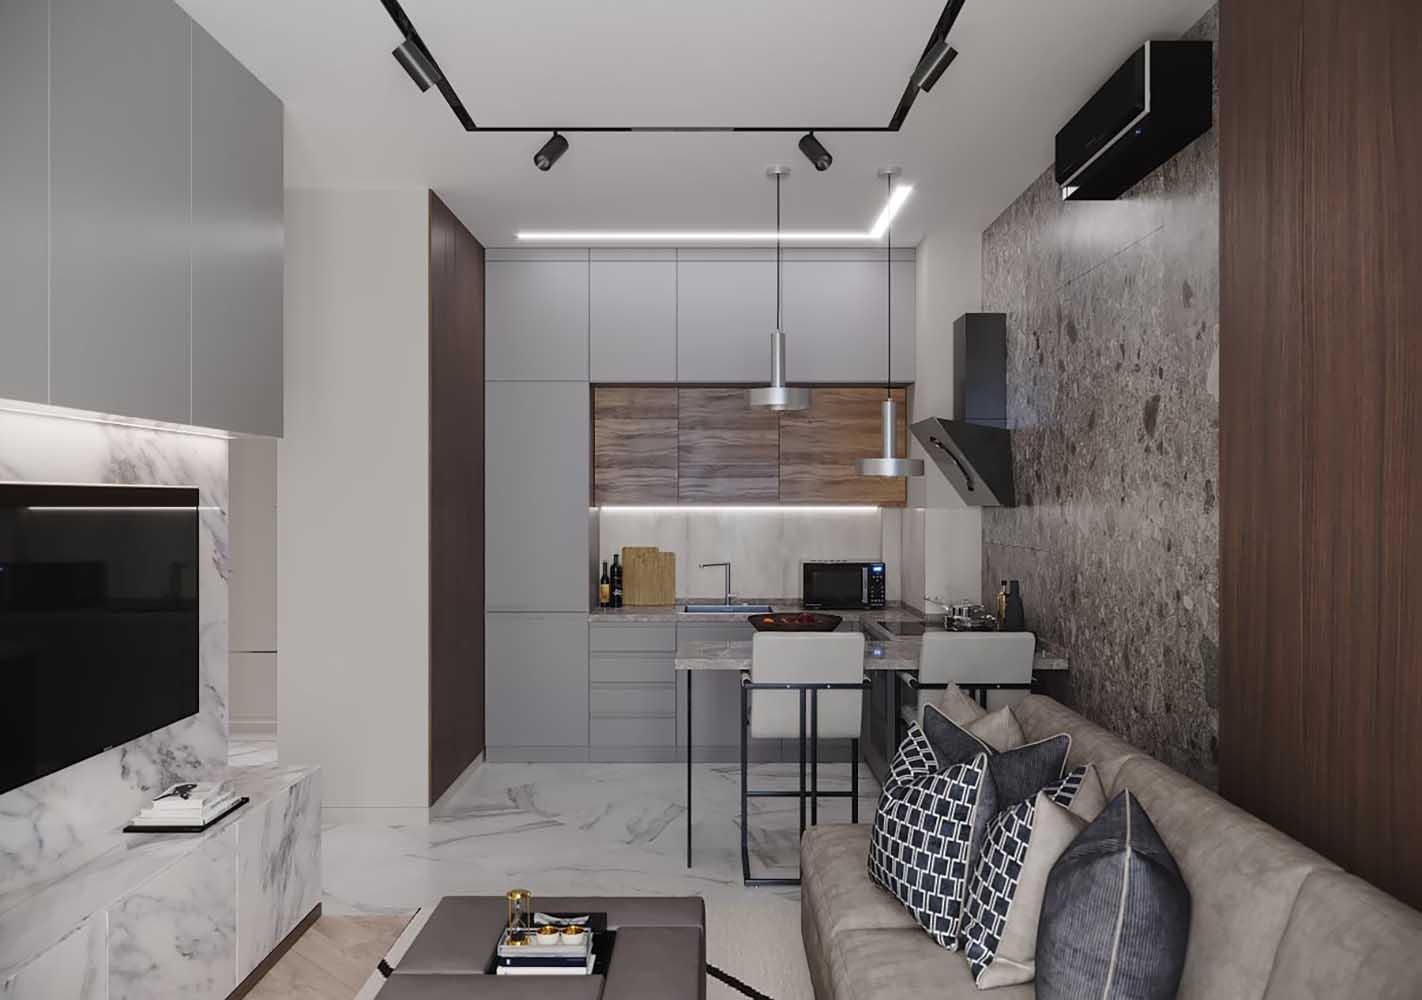 henesi by ns interior design 01 - Дизайн интерьера 1-комн.кв. «Современность в ЖК Henesi House»  by NS INTERIOR DESIGN